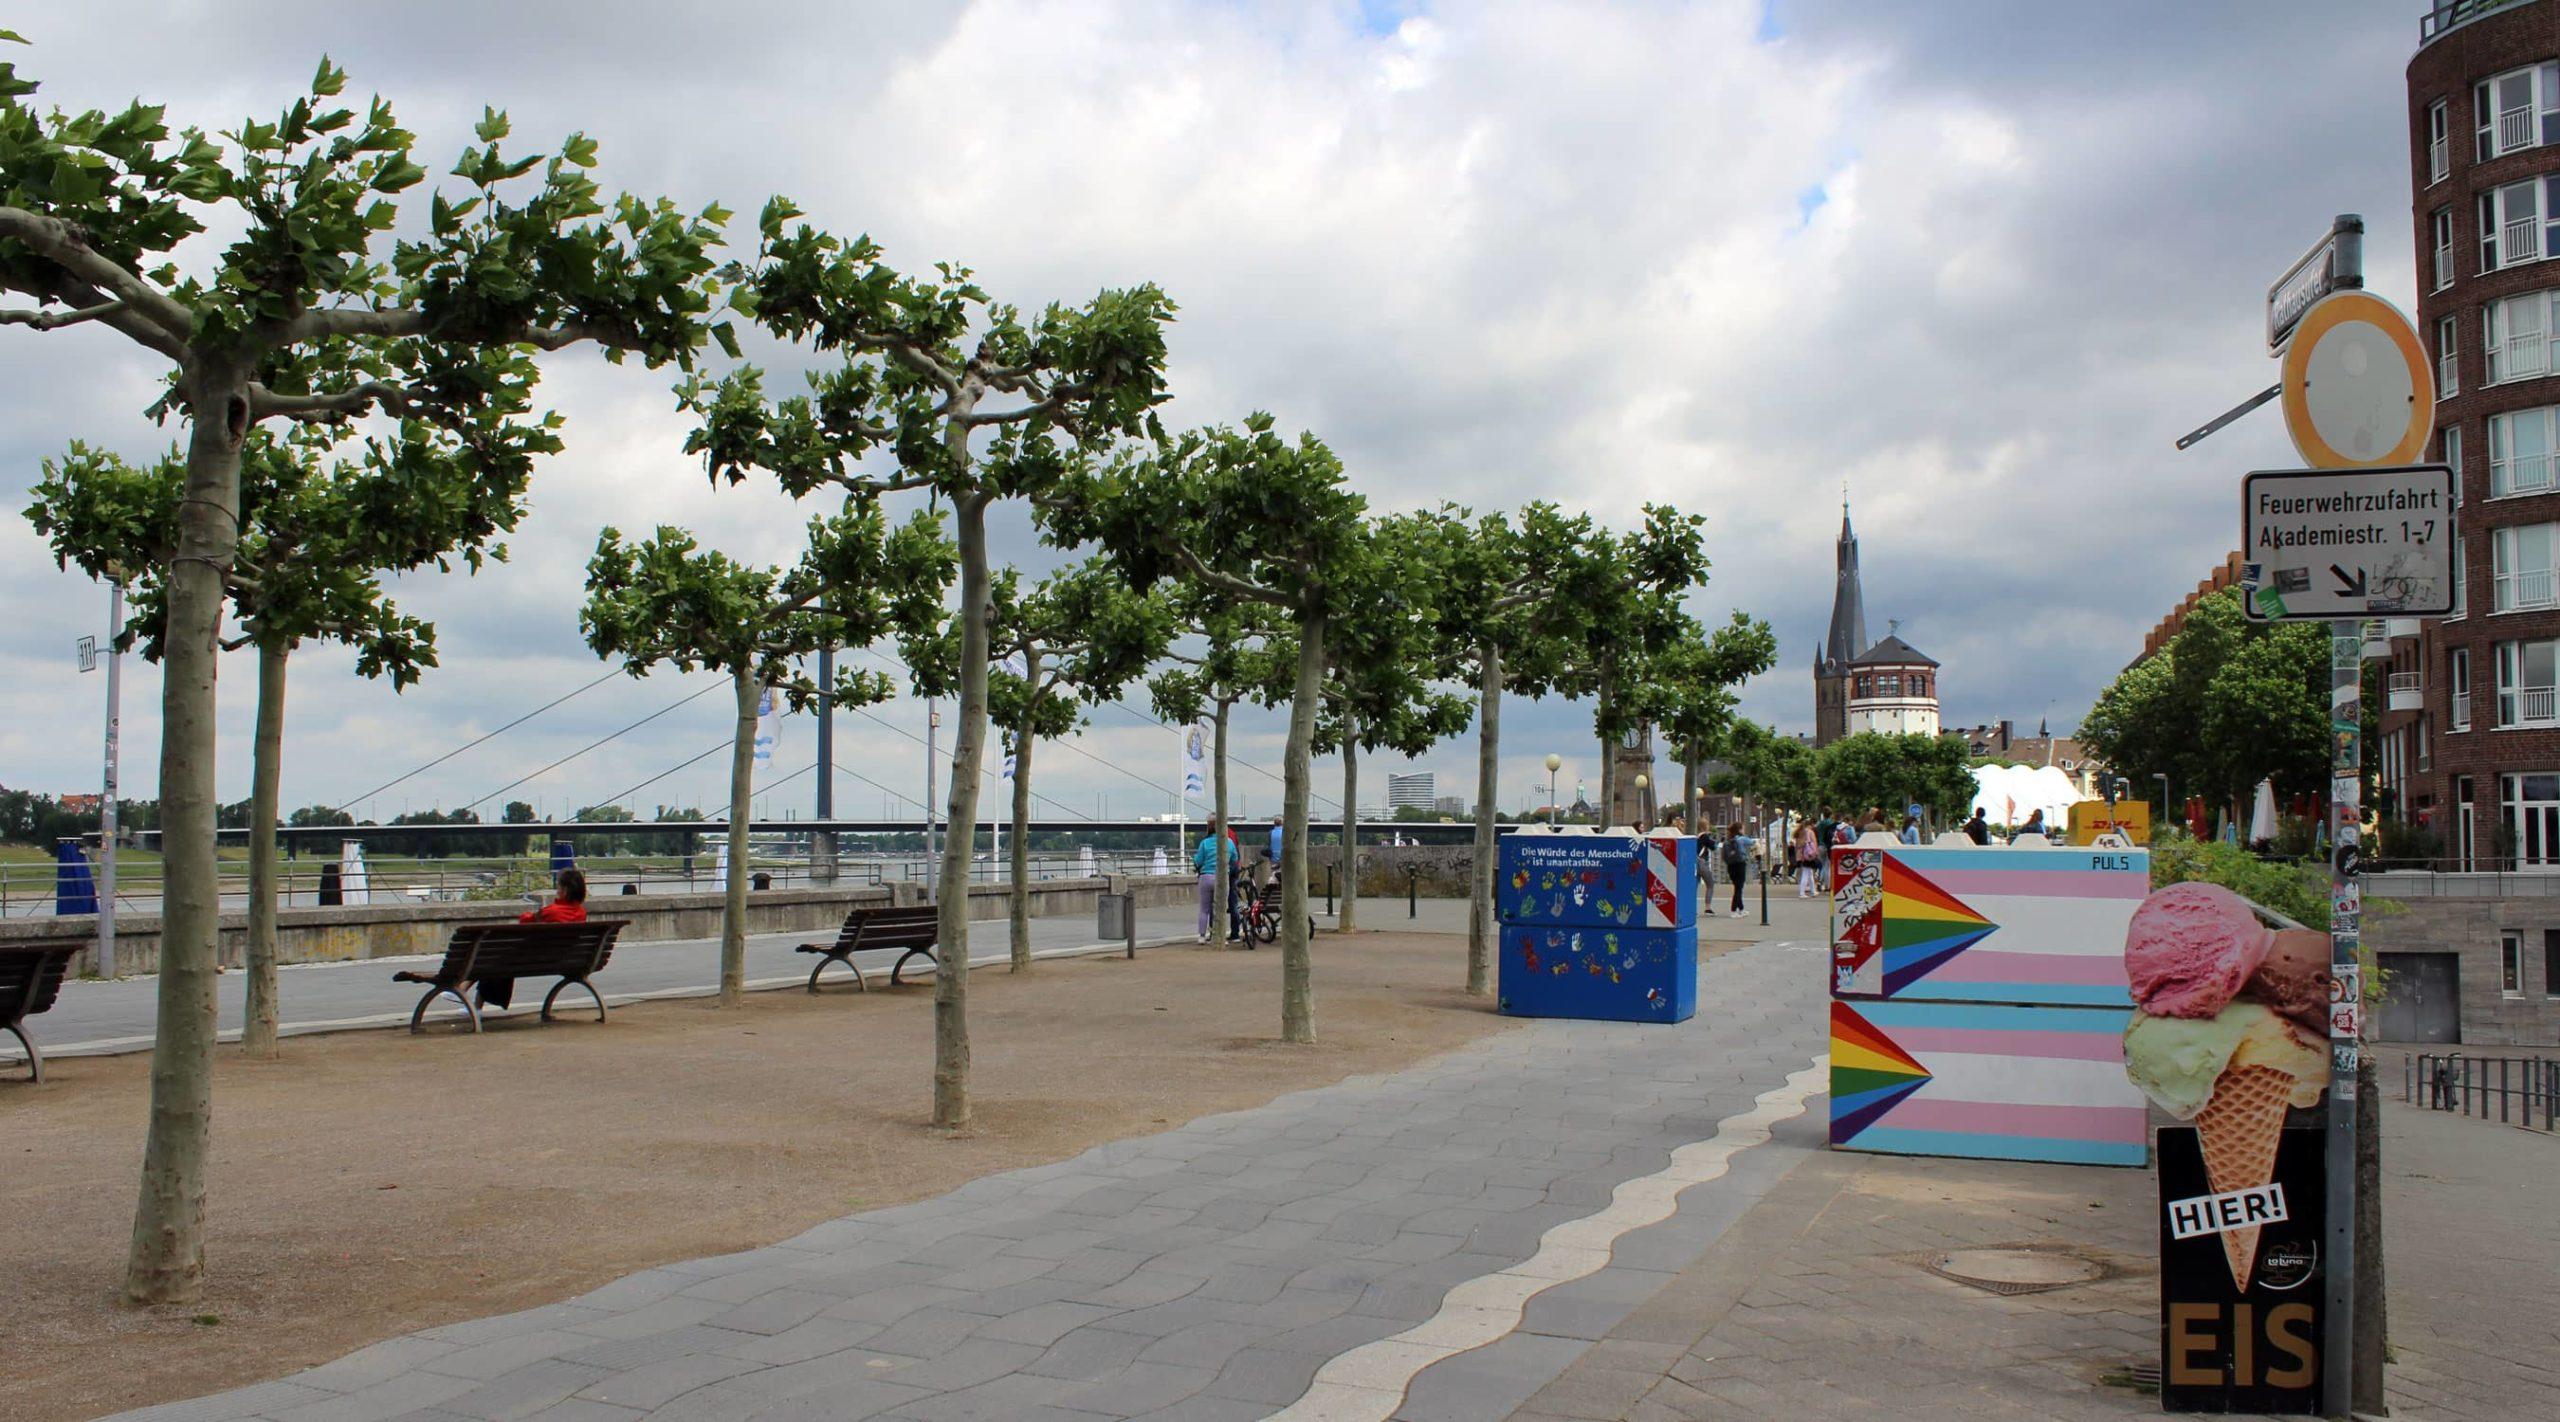 BEstandsbild Rheinpromenade